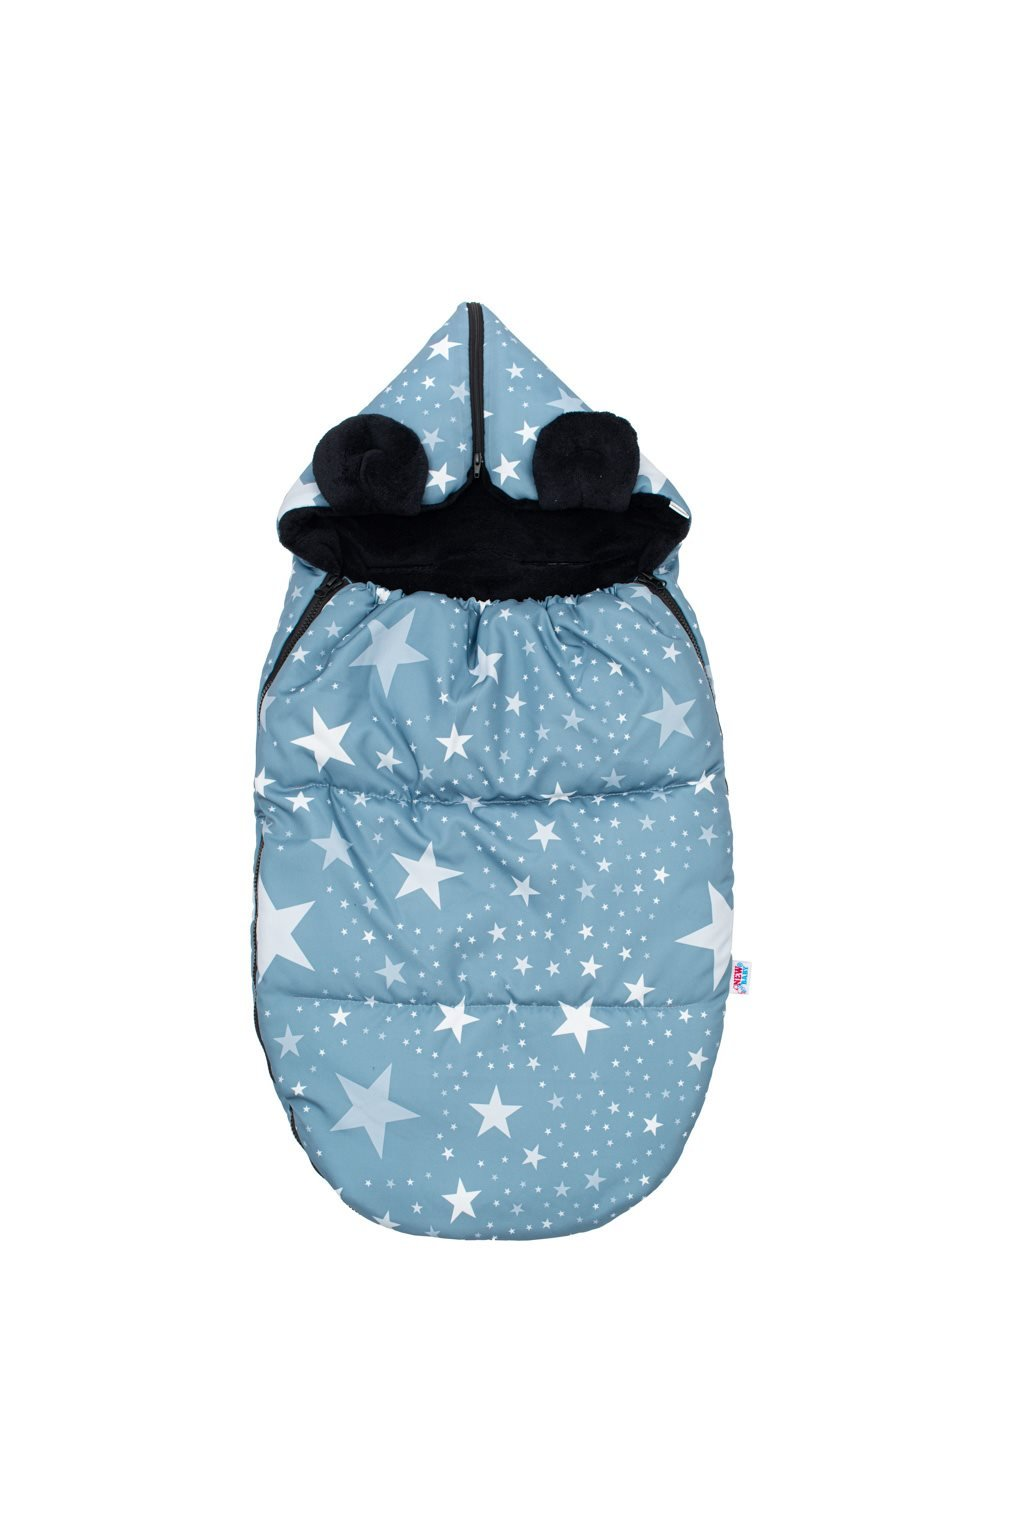 Luxusný fusak New Baby Hviezdičky